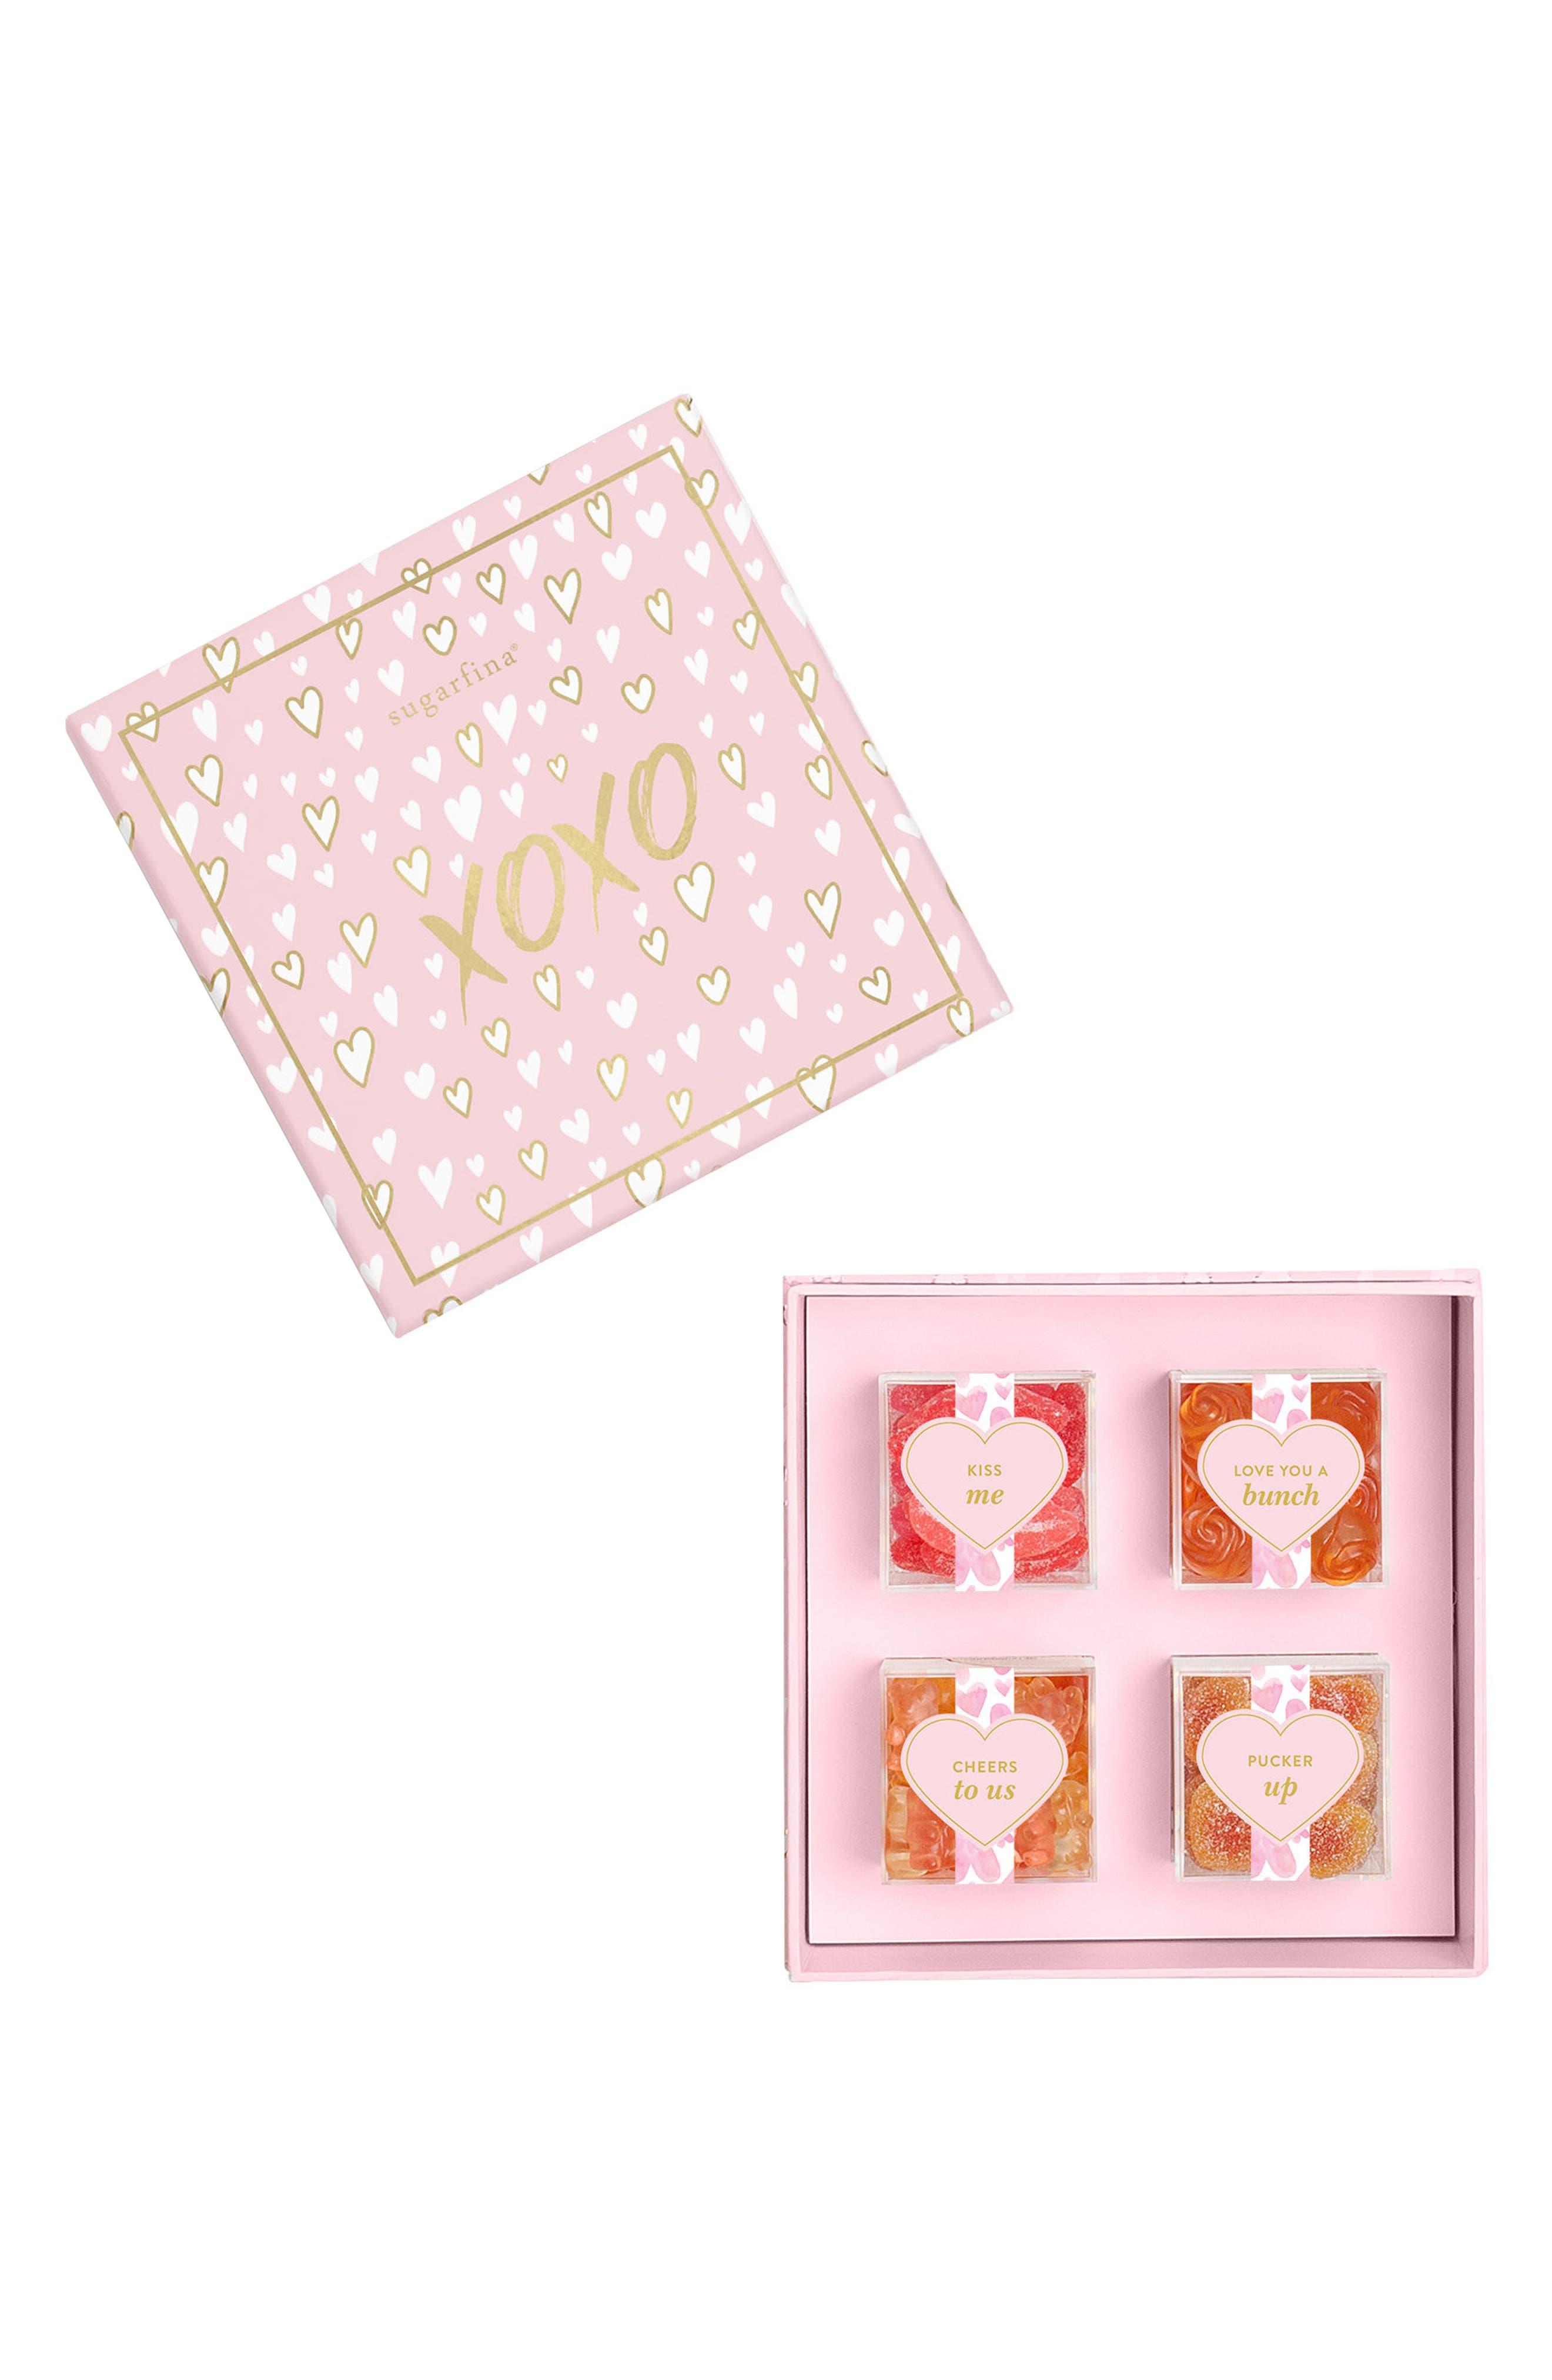 sugarfina XOXO 4-Piece Candy Bento Box